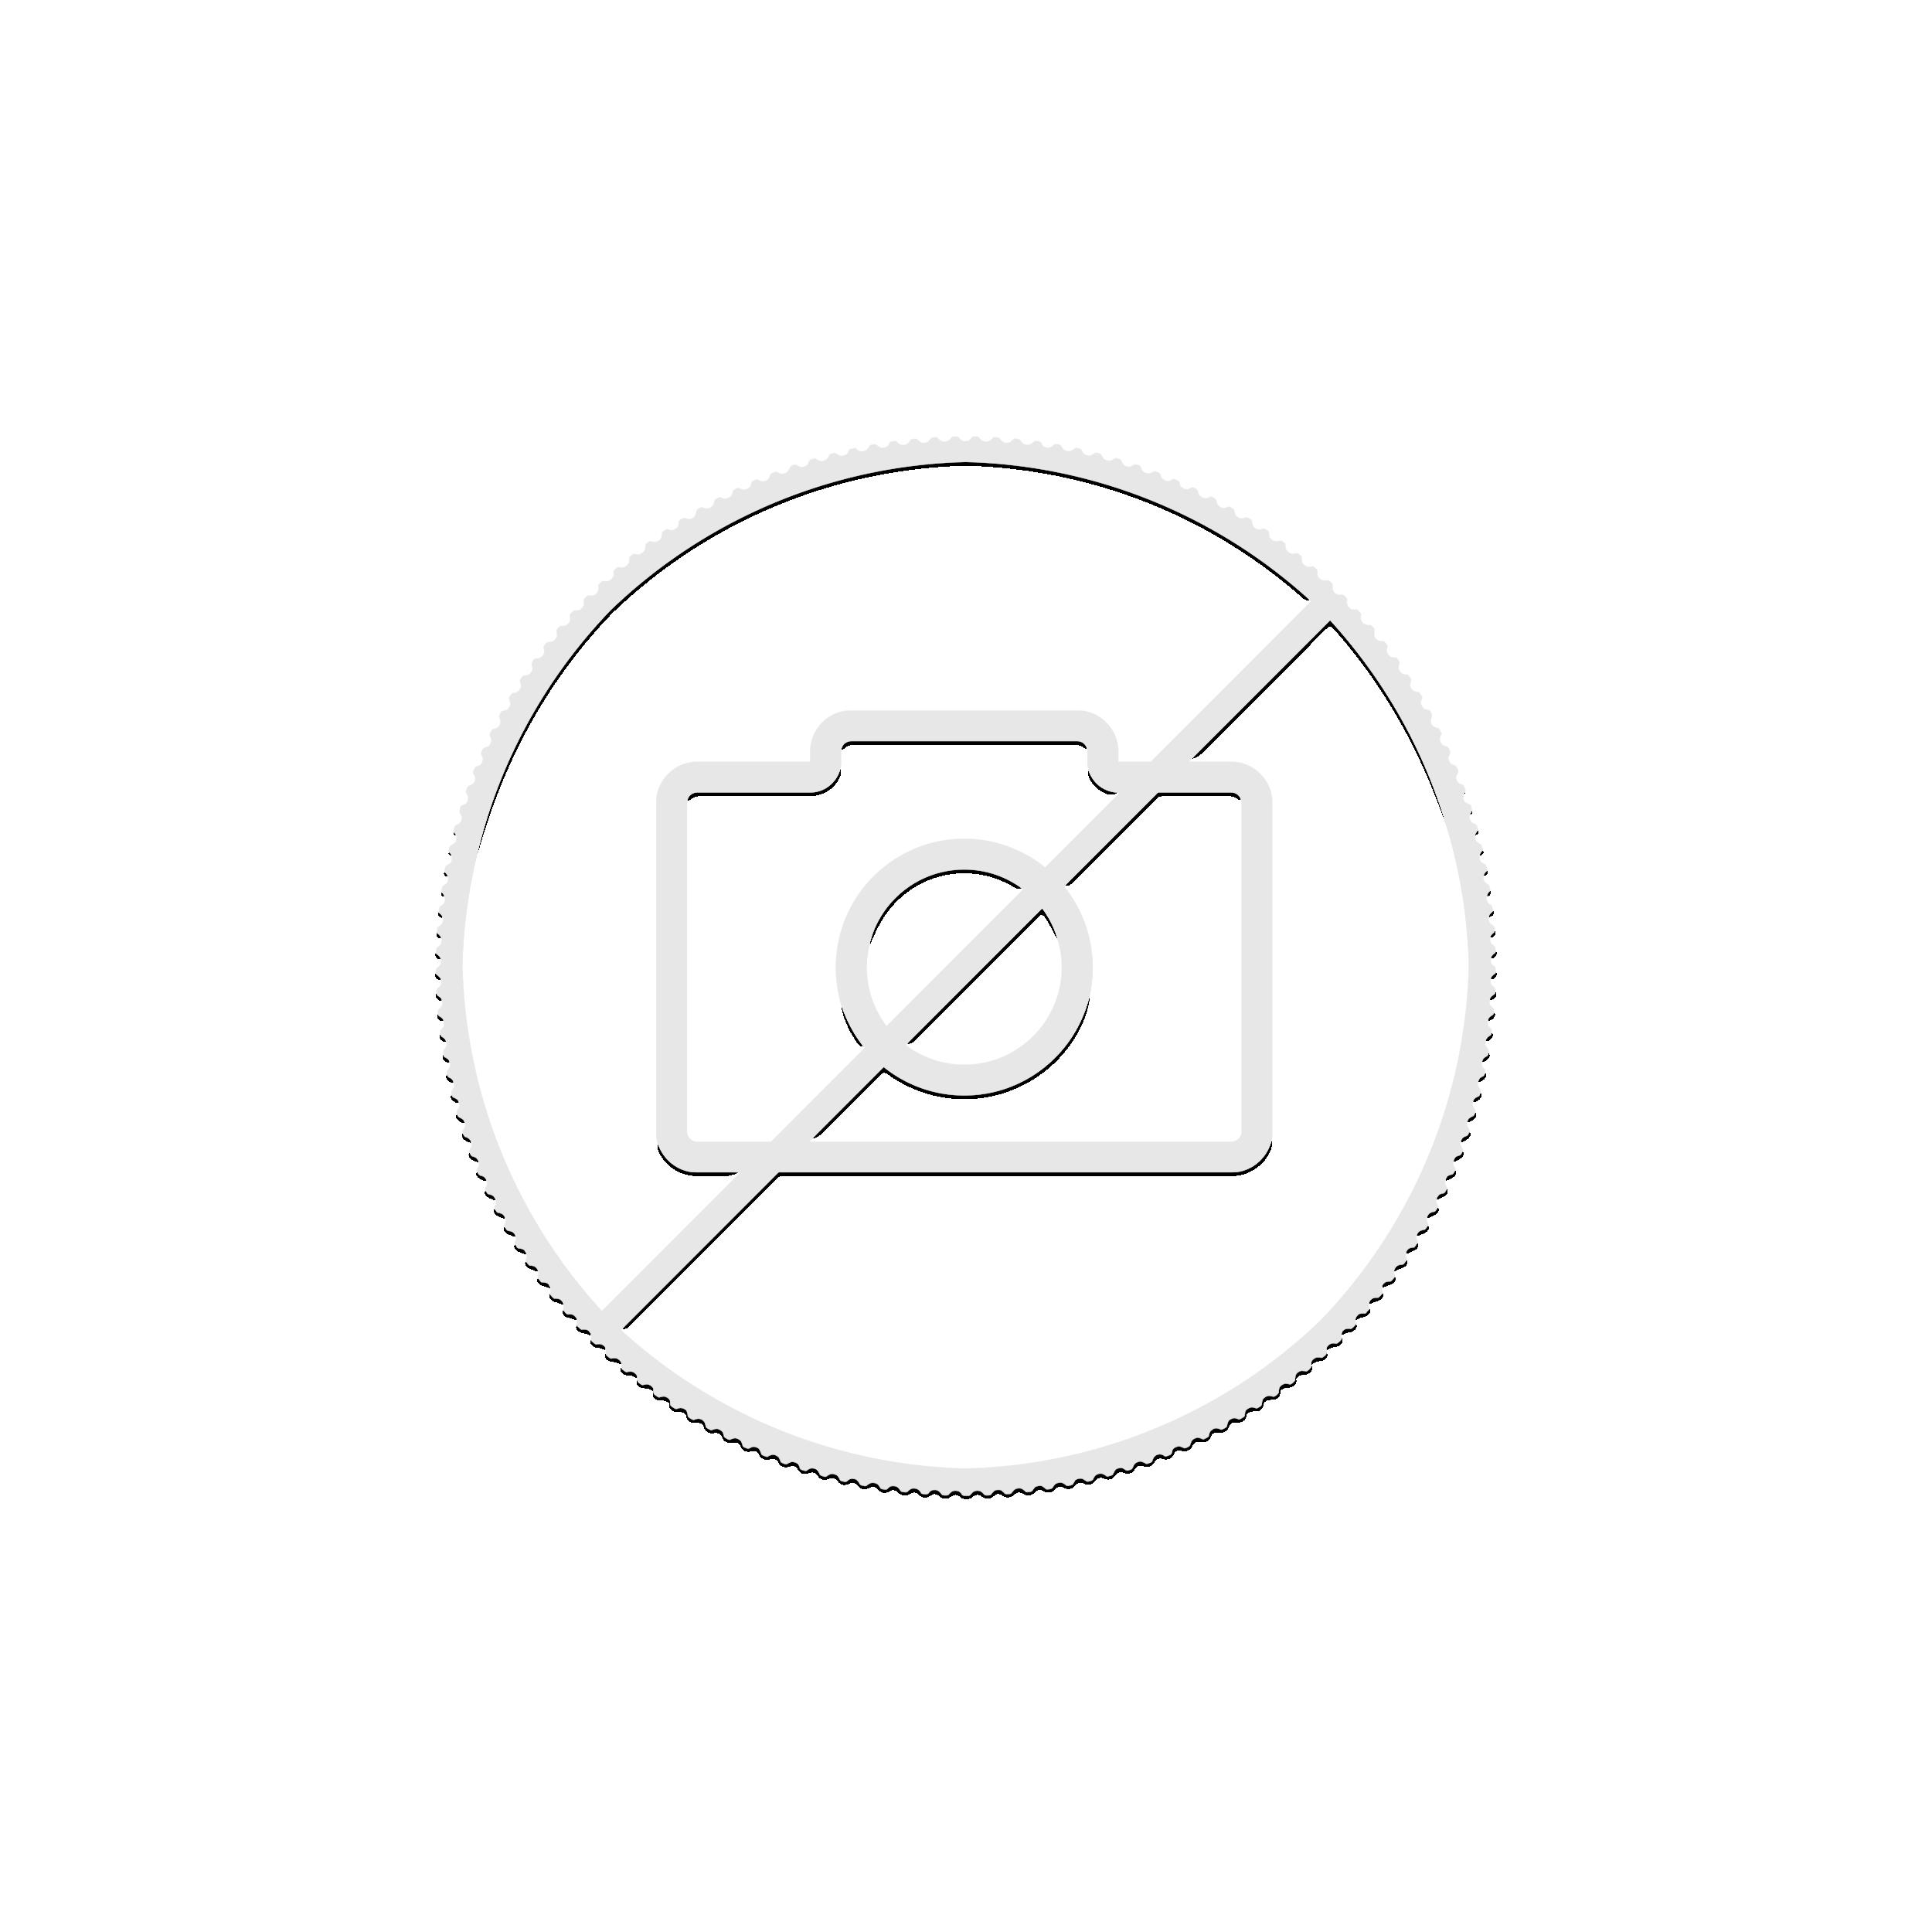 1 Troy ounce silver Kangaroo coin 2020